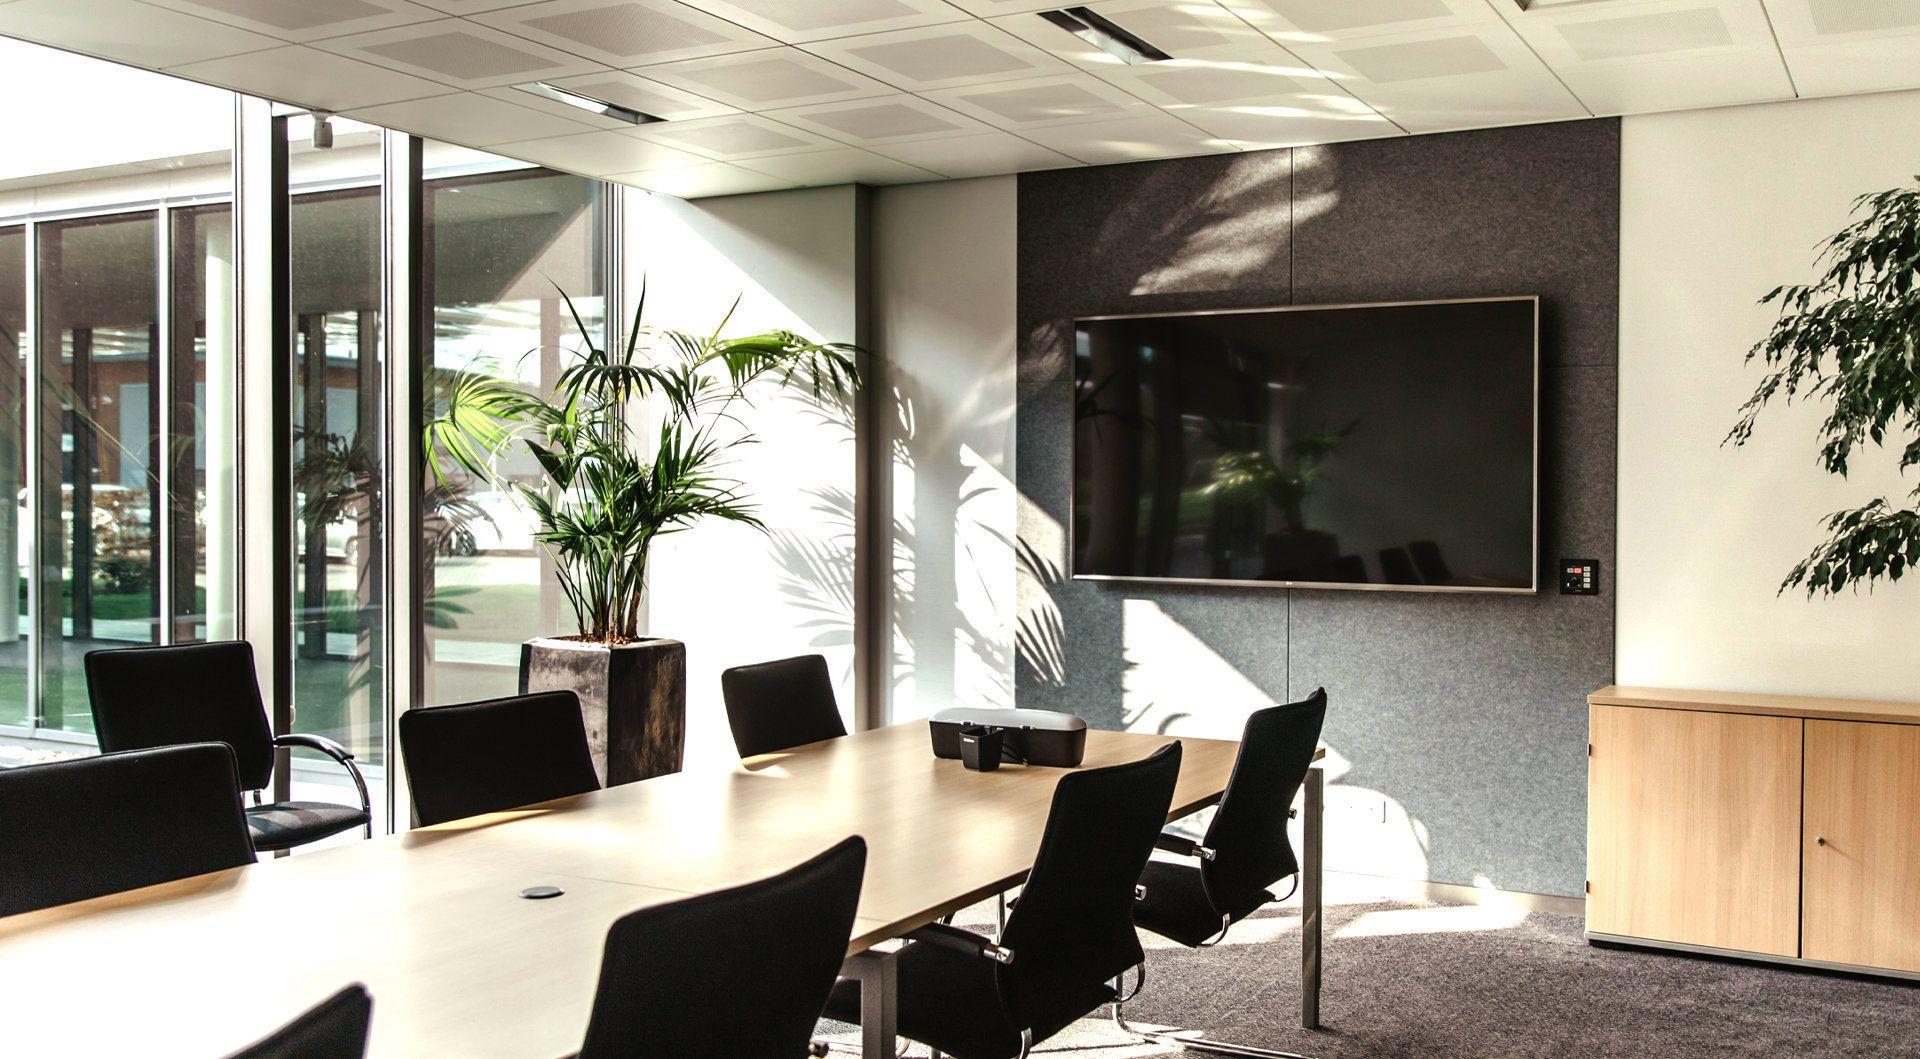 "LG 75TR3BF beeldkrant 190,5 cm (75"") LED 4K Ultra HD Touchscreen Interactief flatscreen Zwart - Case studie de vries"